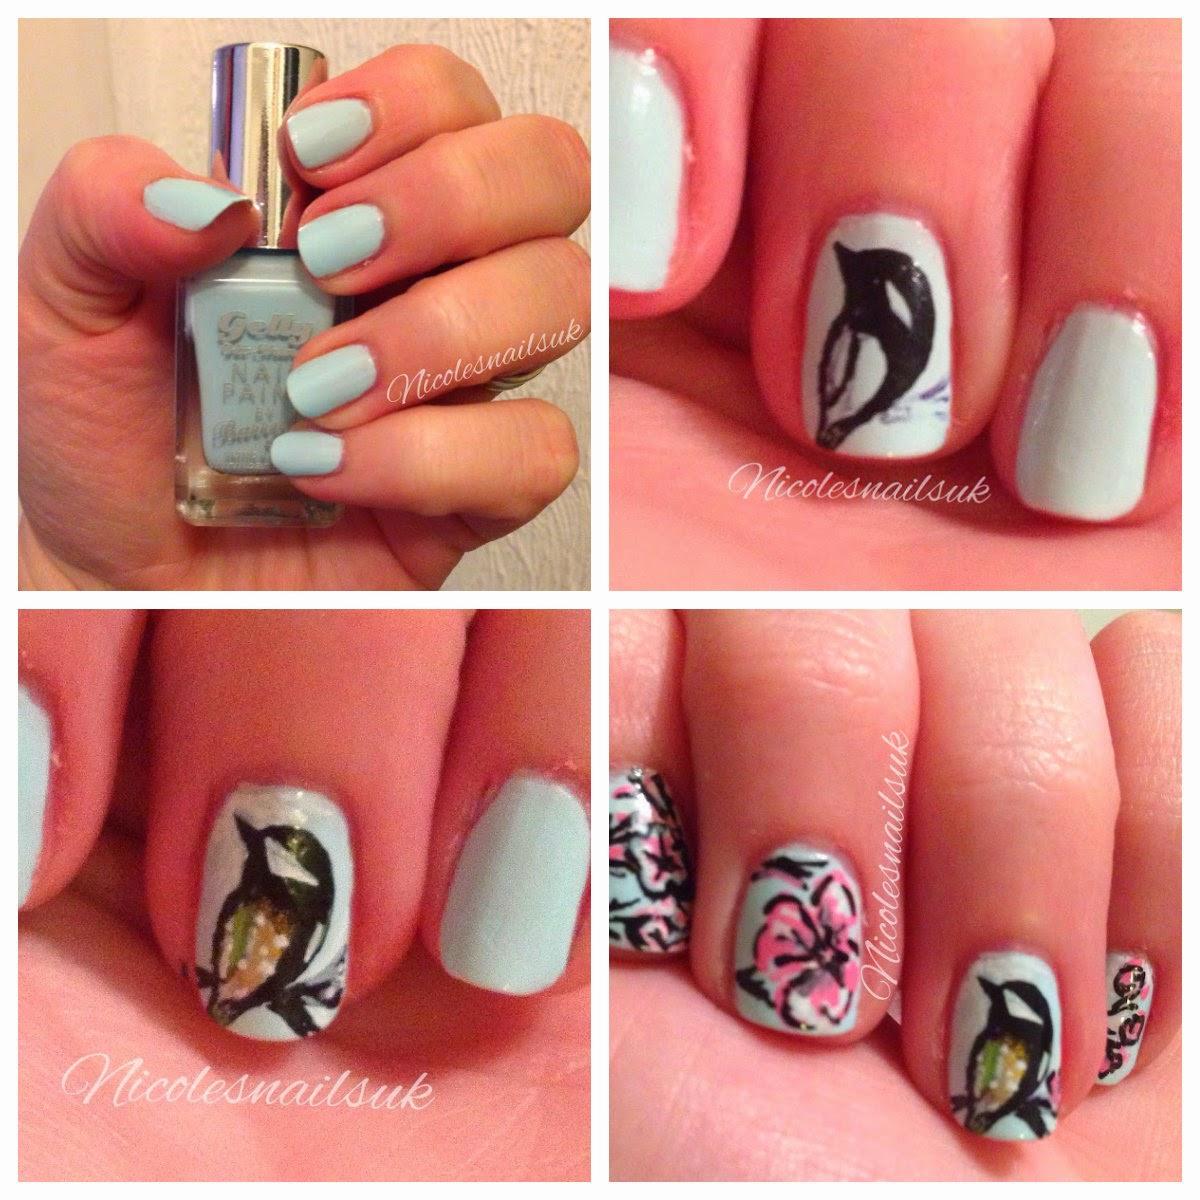 nicole's nails UK barry M